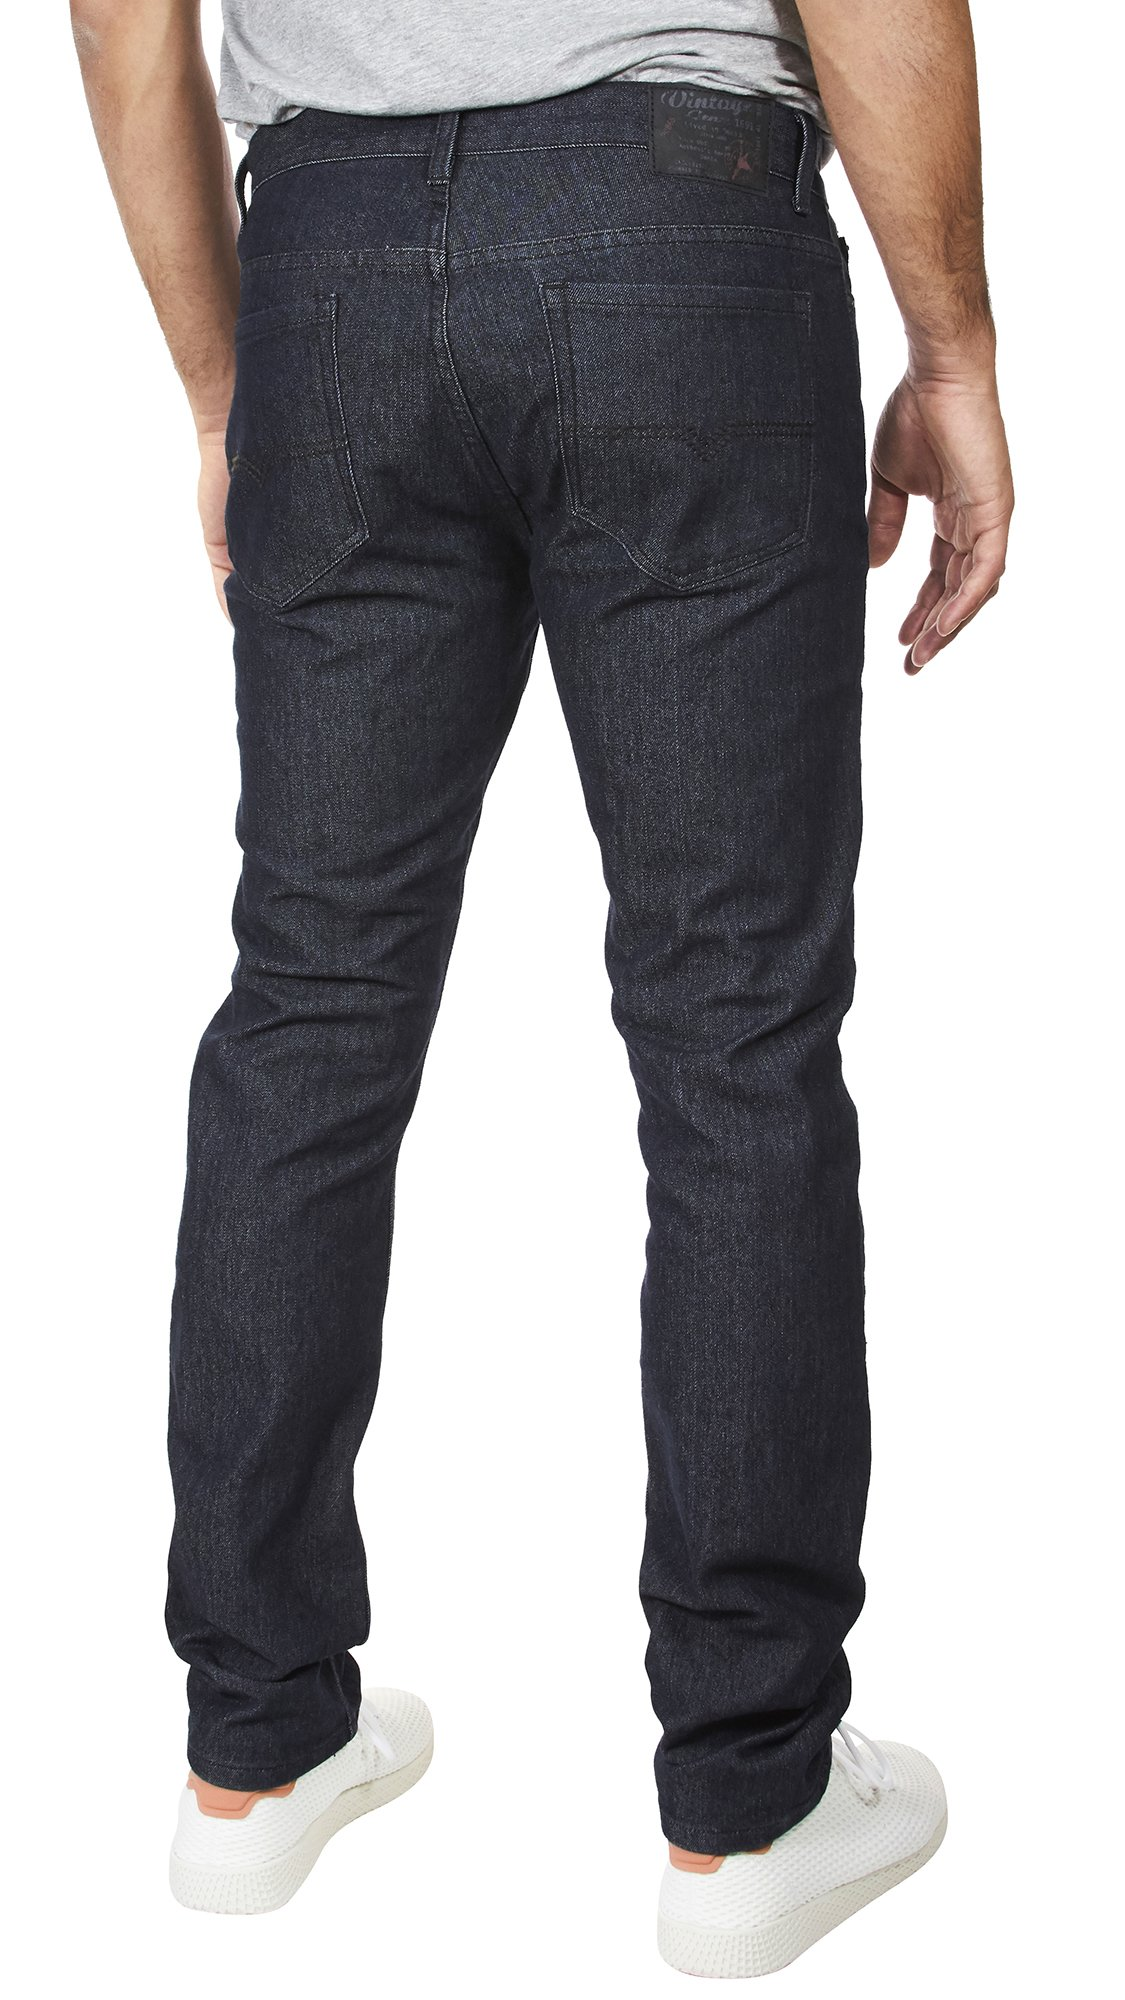 VINTAGE GENES 1891 Mens Stretch Skinny Washed Denim Jeans, Dark Enzyme Blue 34x32 by VINTAGE GENES (Image #3)